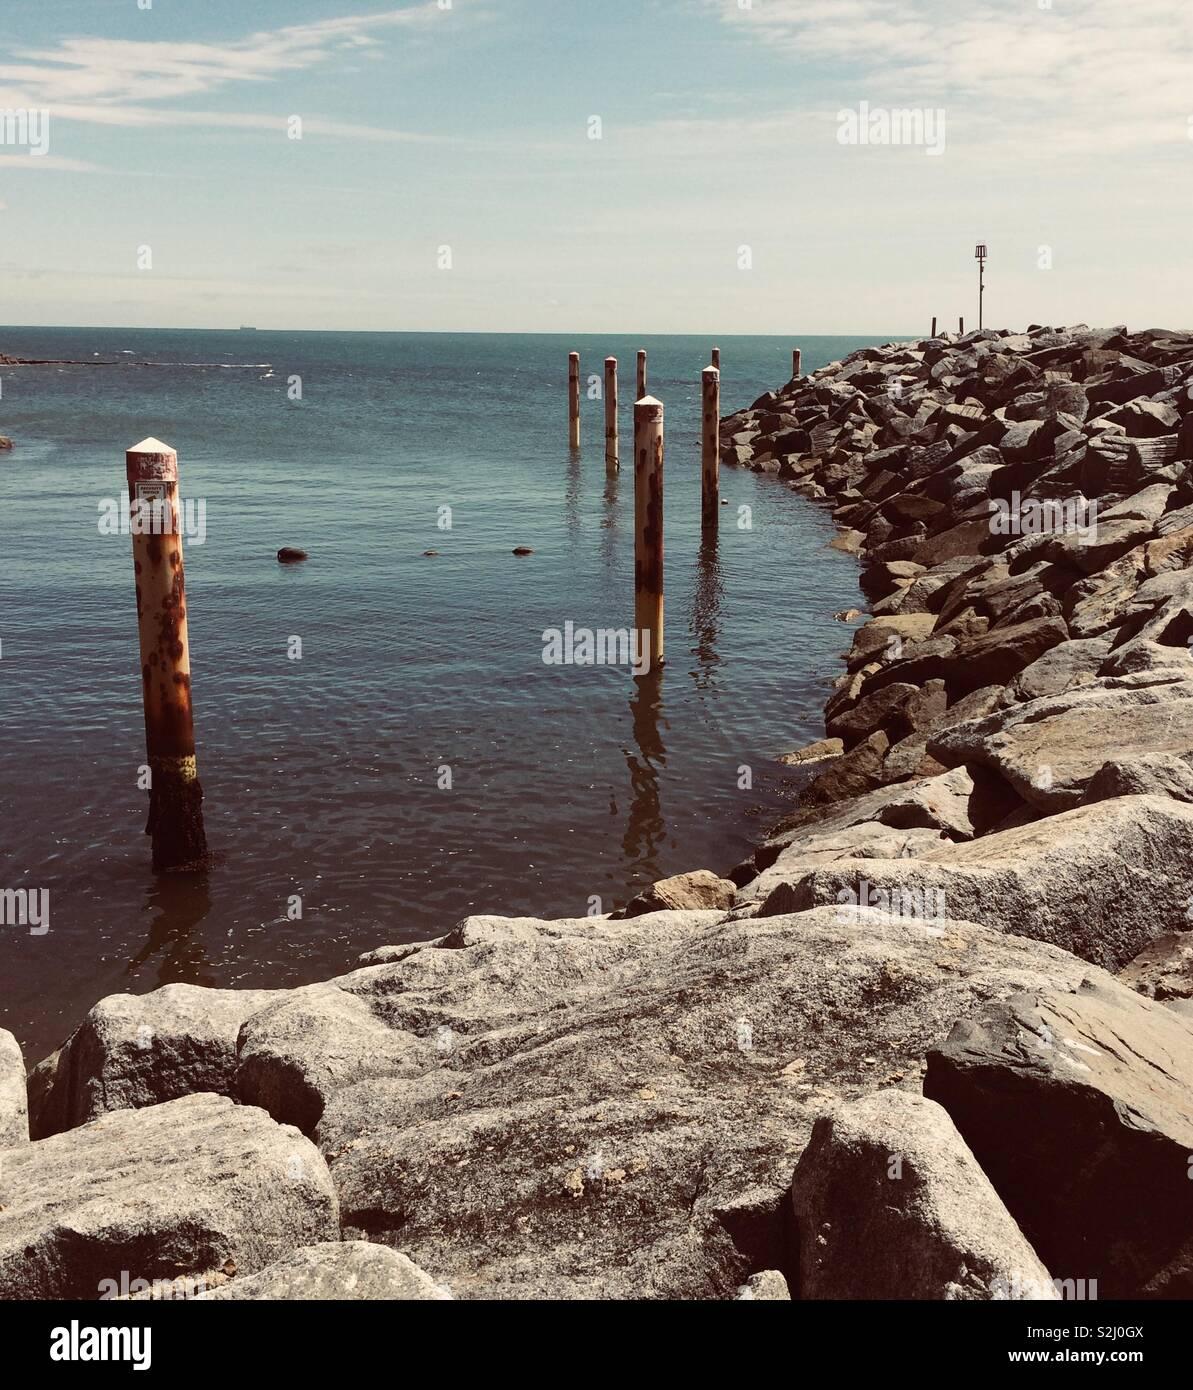 Ventnor harbour, Isle of Wight, UK. Stock Photo